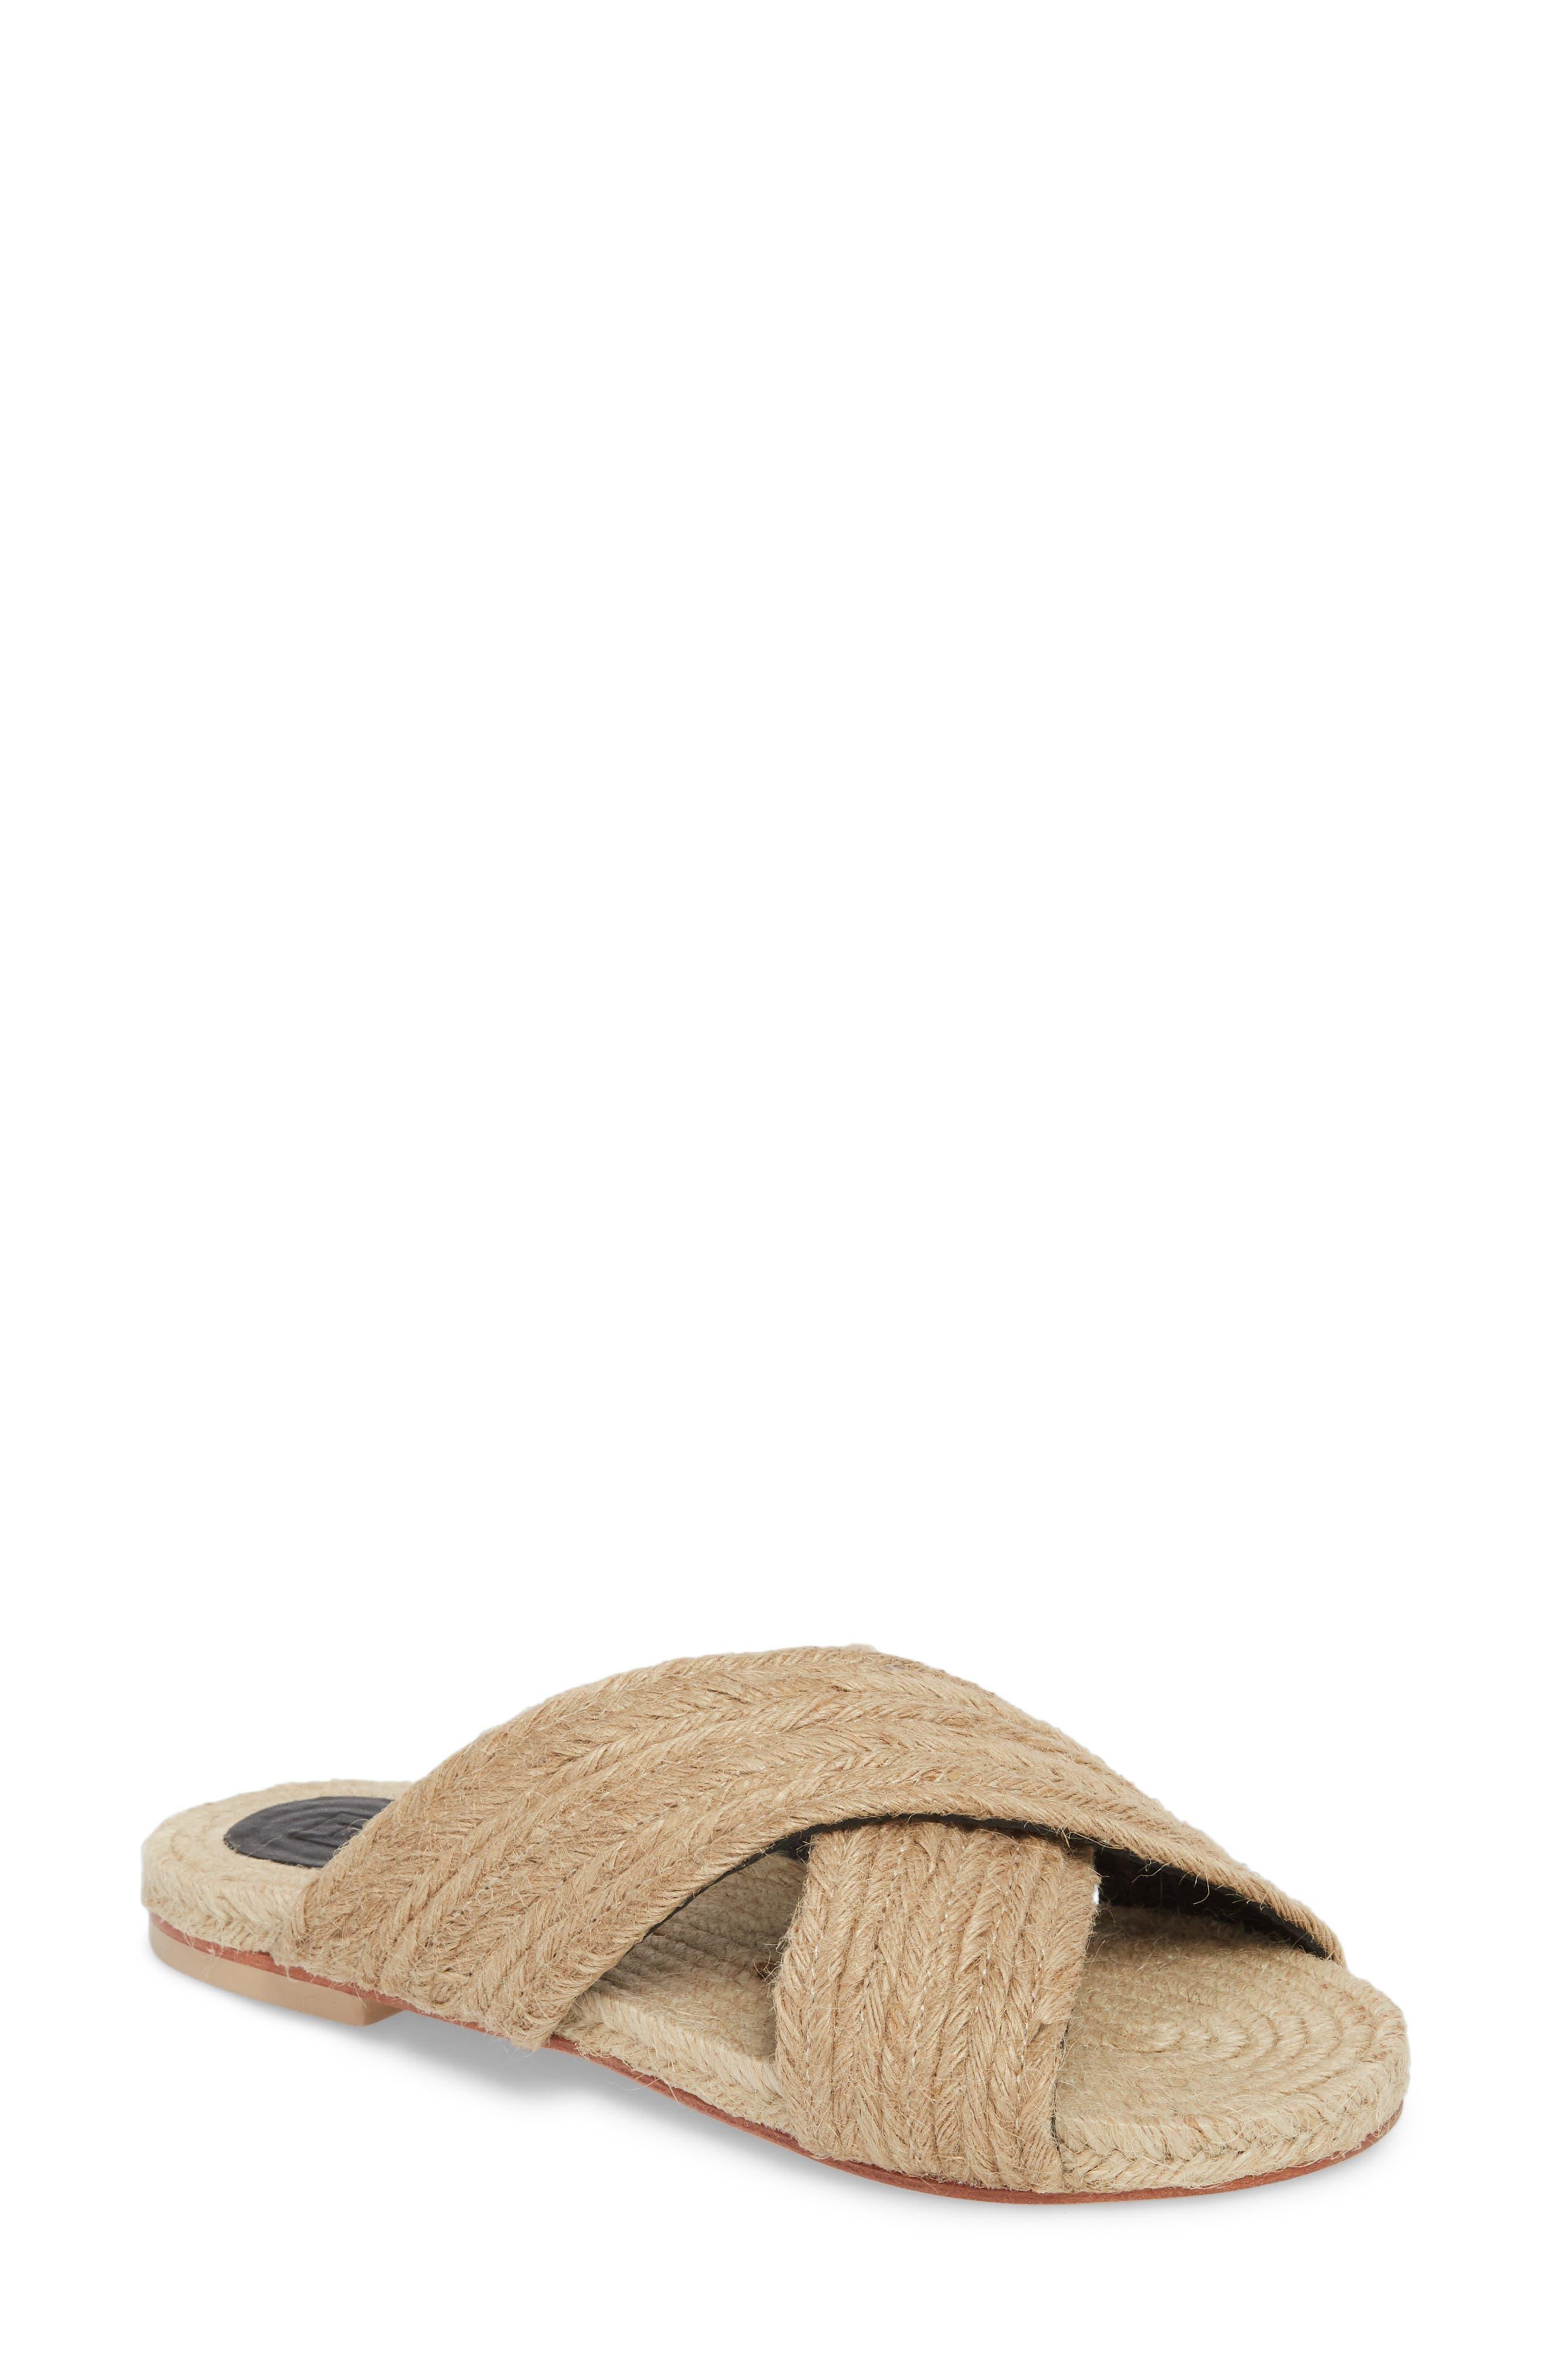 Felilx Rope Slide Sandal,                             Main thumbnail 1, color,                             250